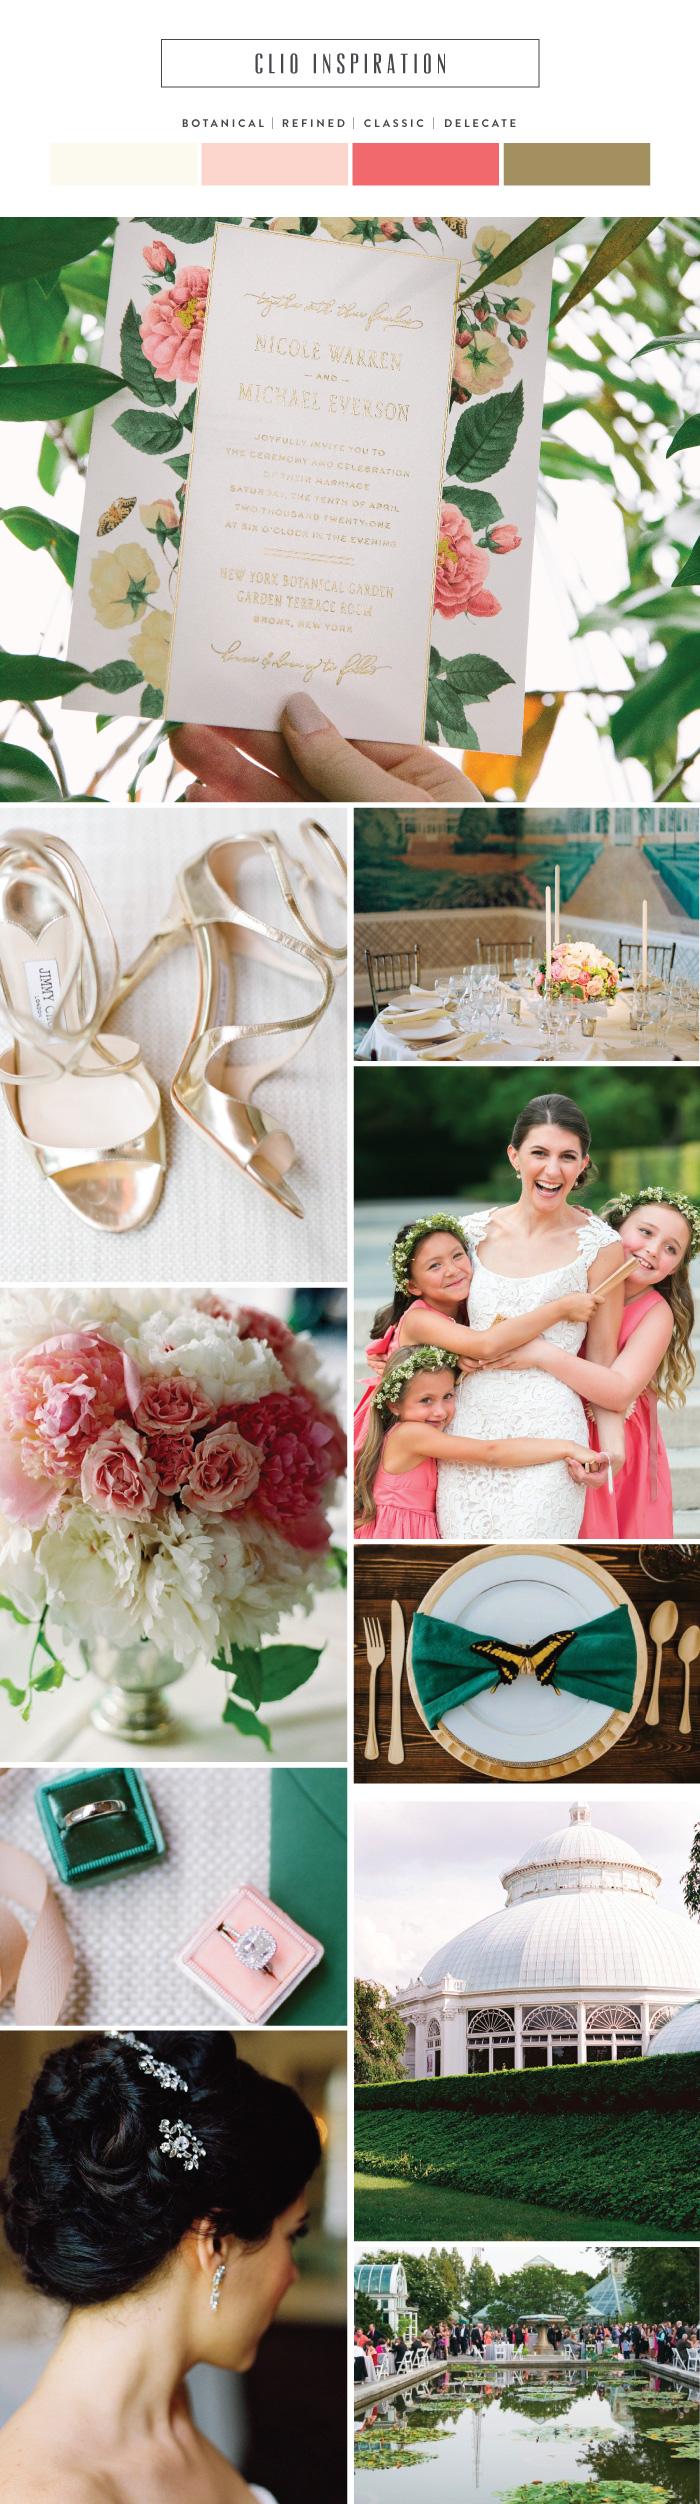 Introducing Clio: New York Botanical Garden inspired wedding invitations | Bella Figura